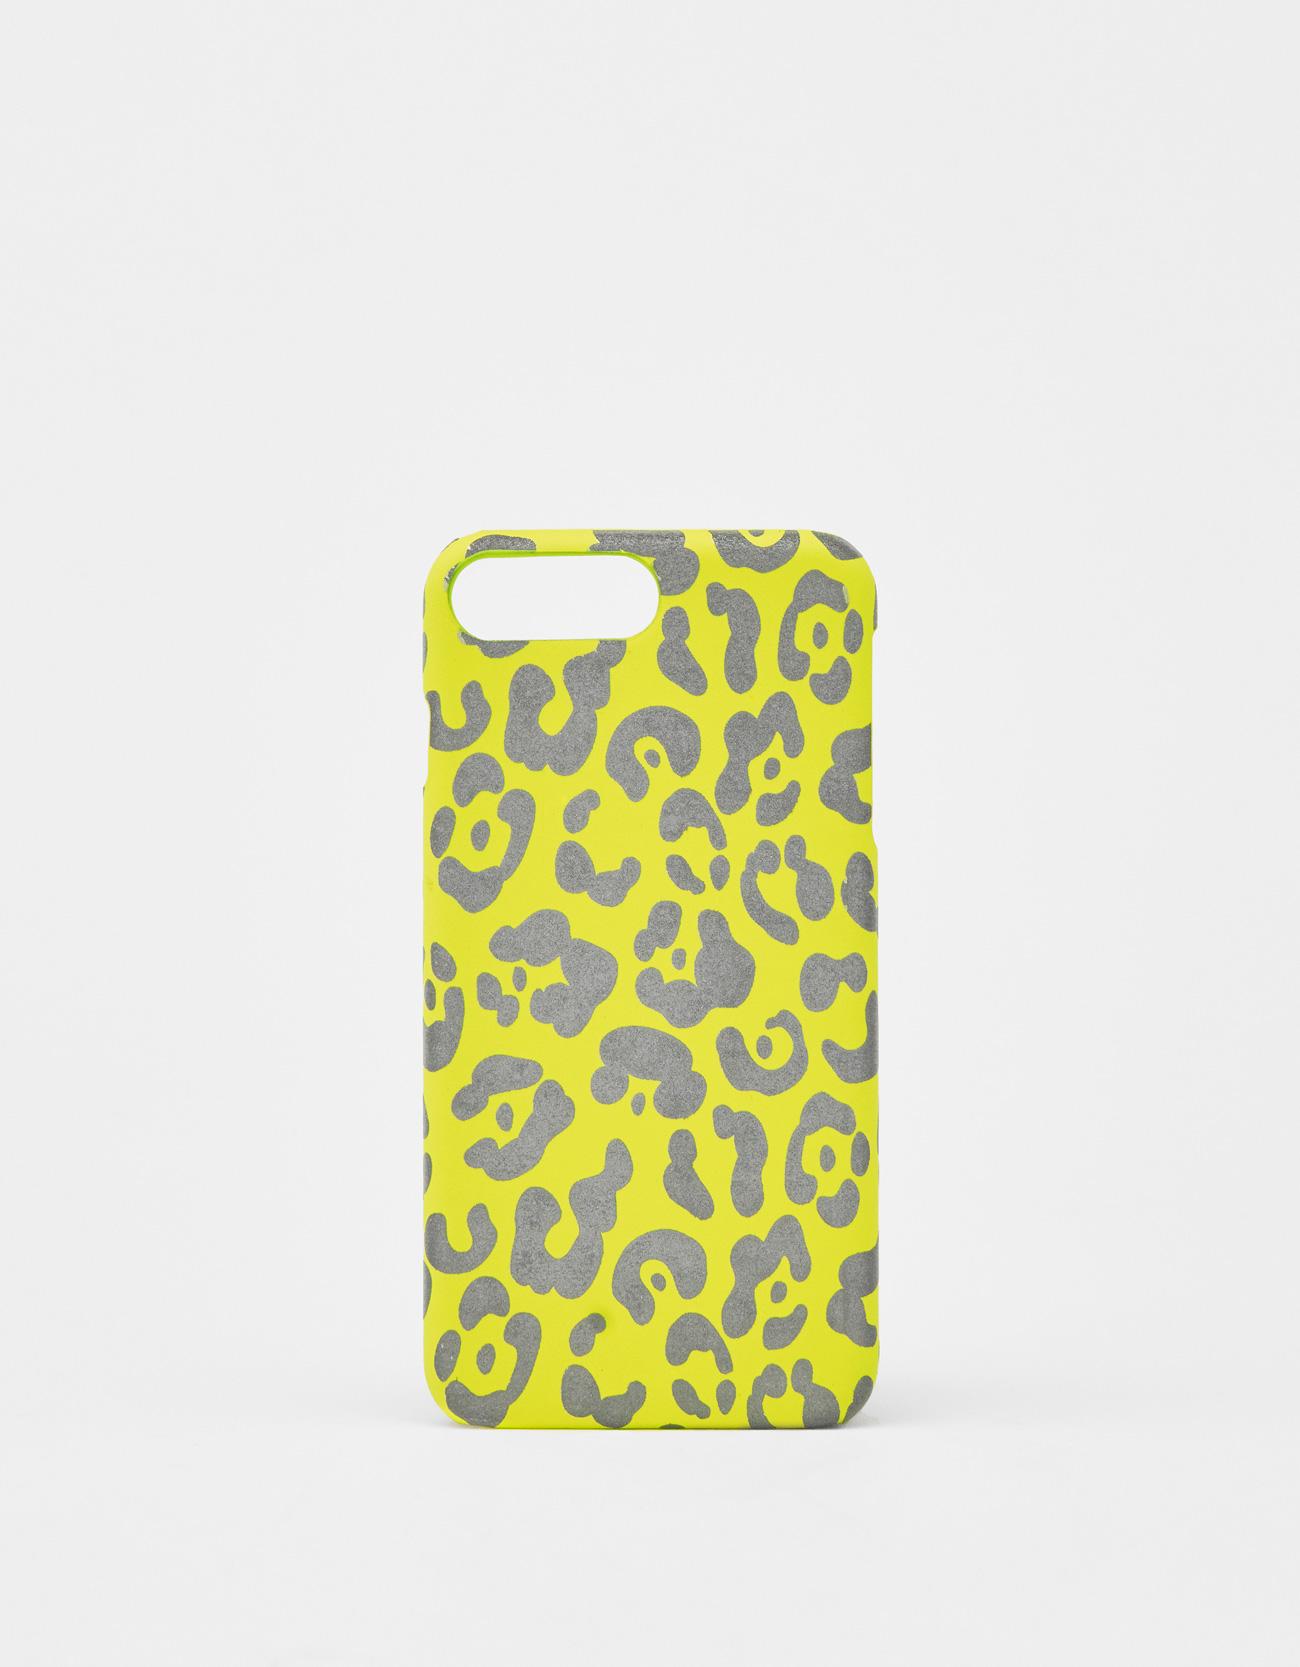 reputable site d7519 40da8 Reflective leopard print iPhone 6 Plus / 7 Plus / 8 Plus case - iPhone  Cases - Bershka Kazajstan